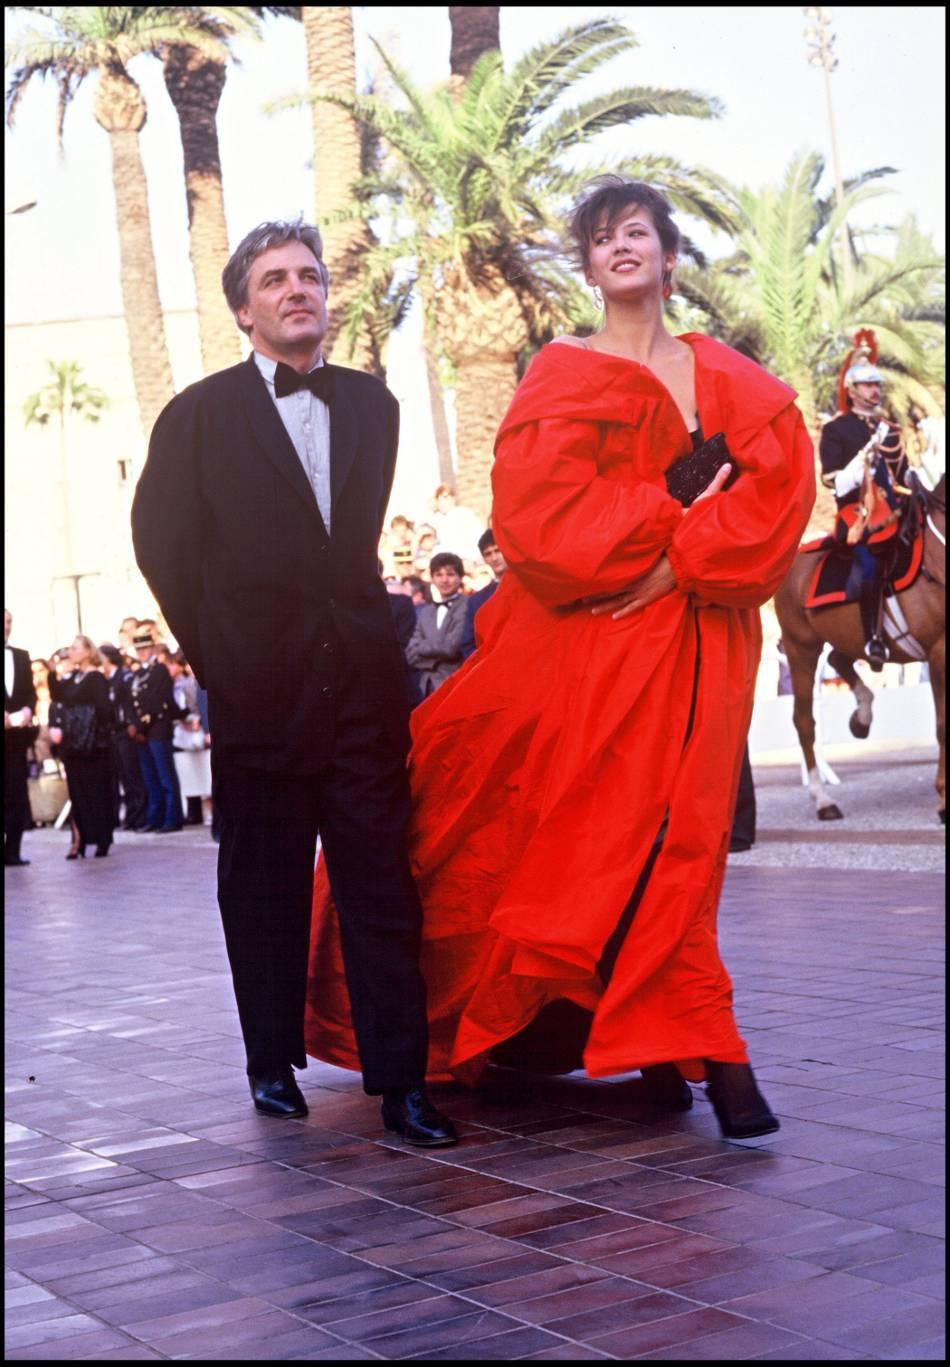 Sophie Marceau et Andrzej Zulawski divorcent en 2001.